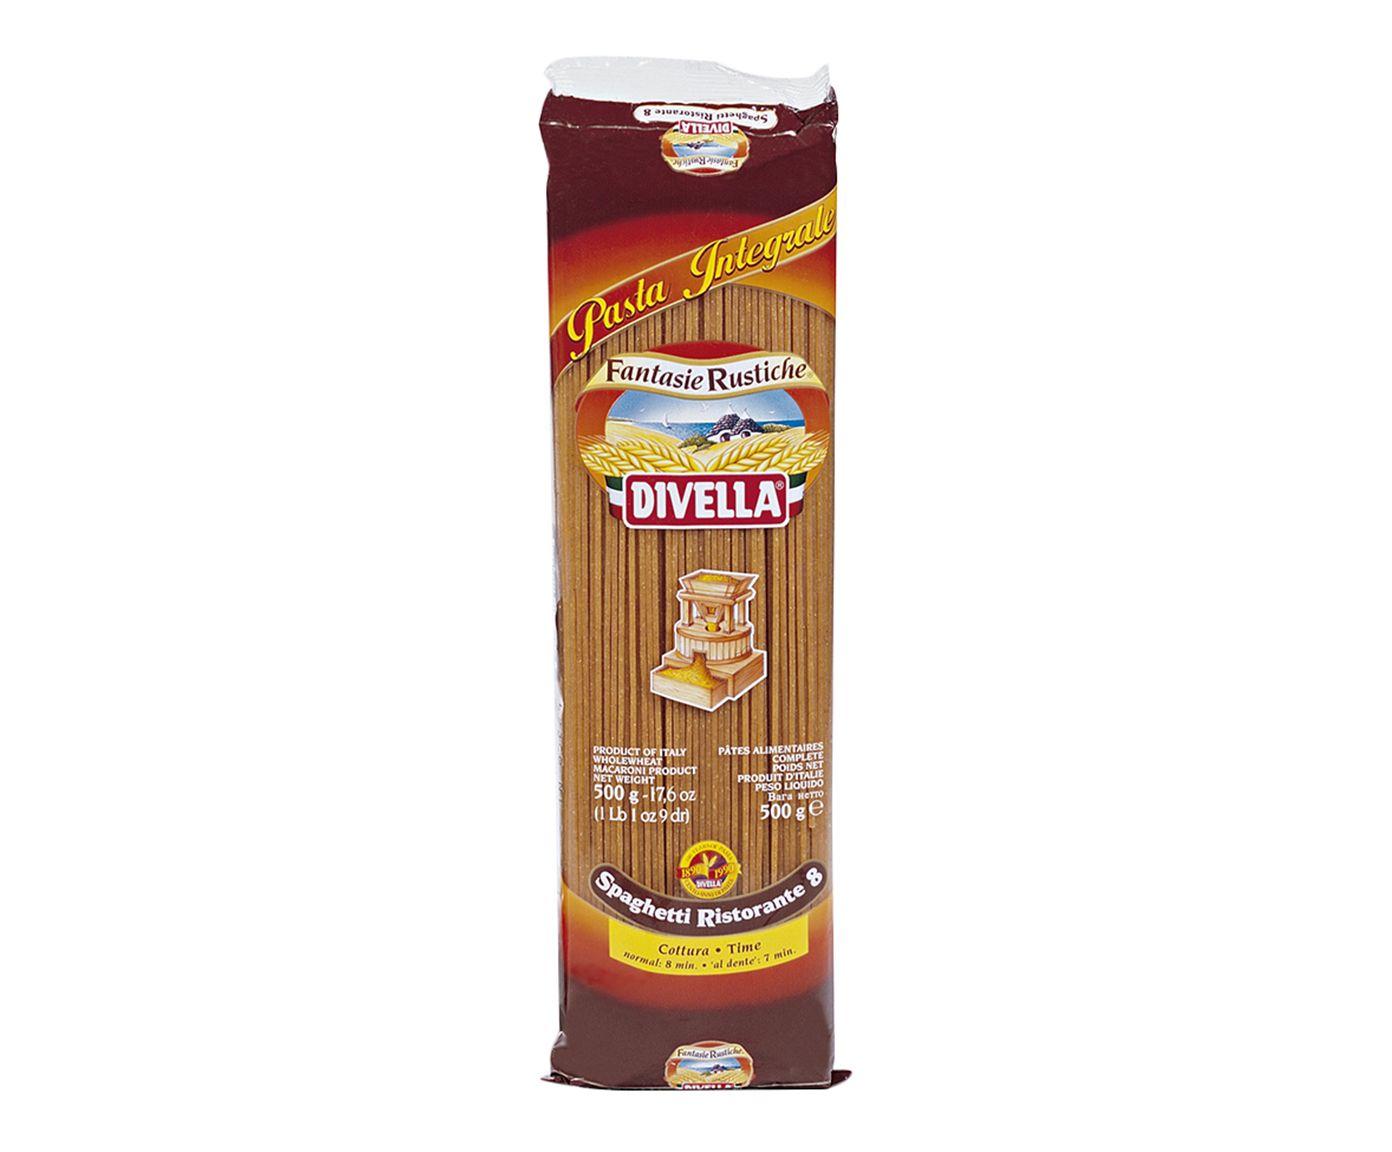 Massa N°08 Spaghetti Ristorante Integral - 500G | Westwing.com.br